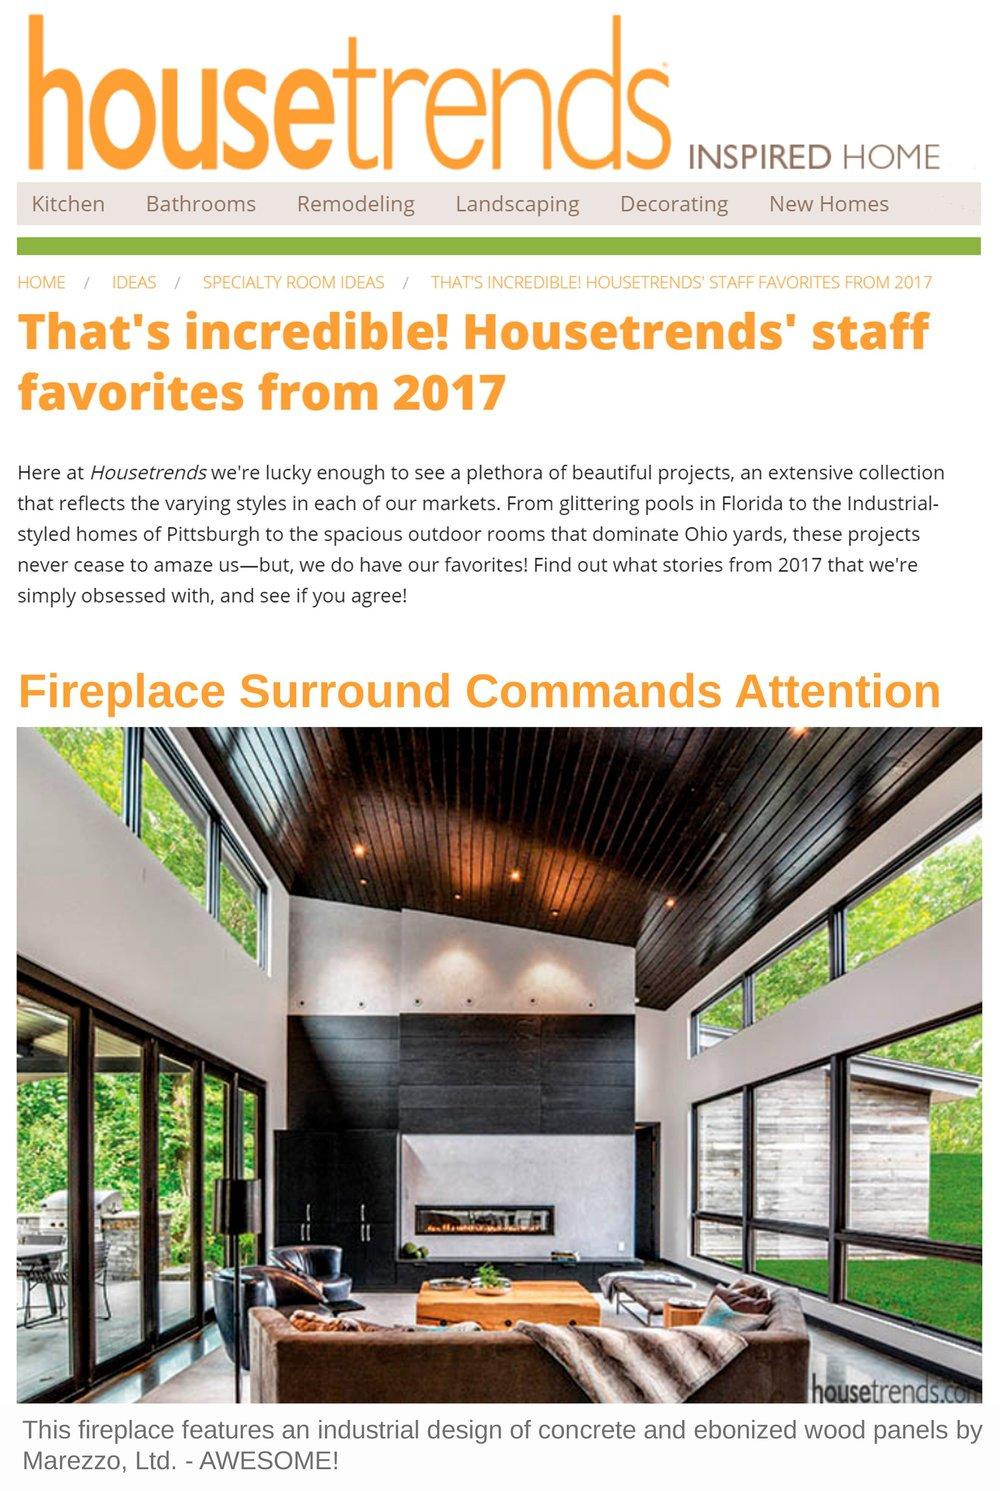 Marezzo+Housetrends+Favorites+2017.jpg